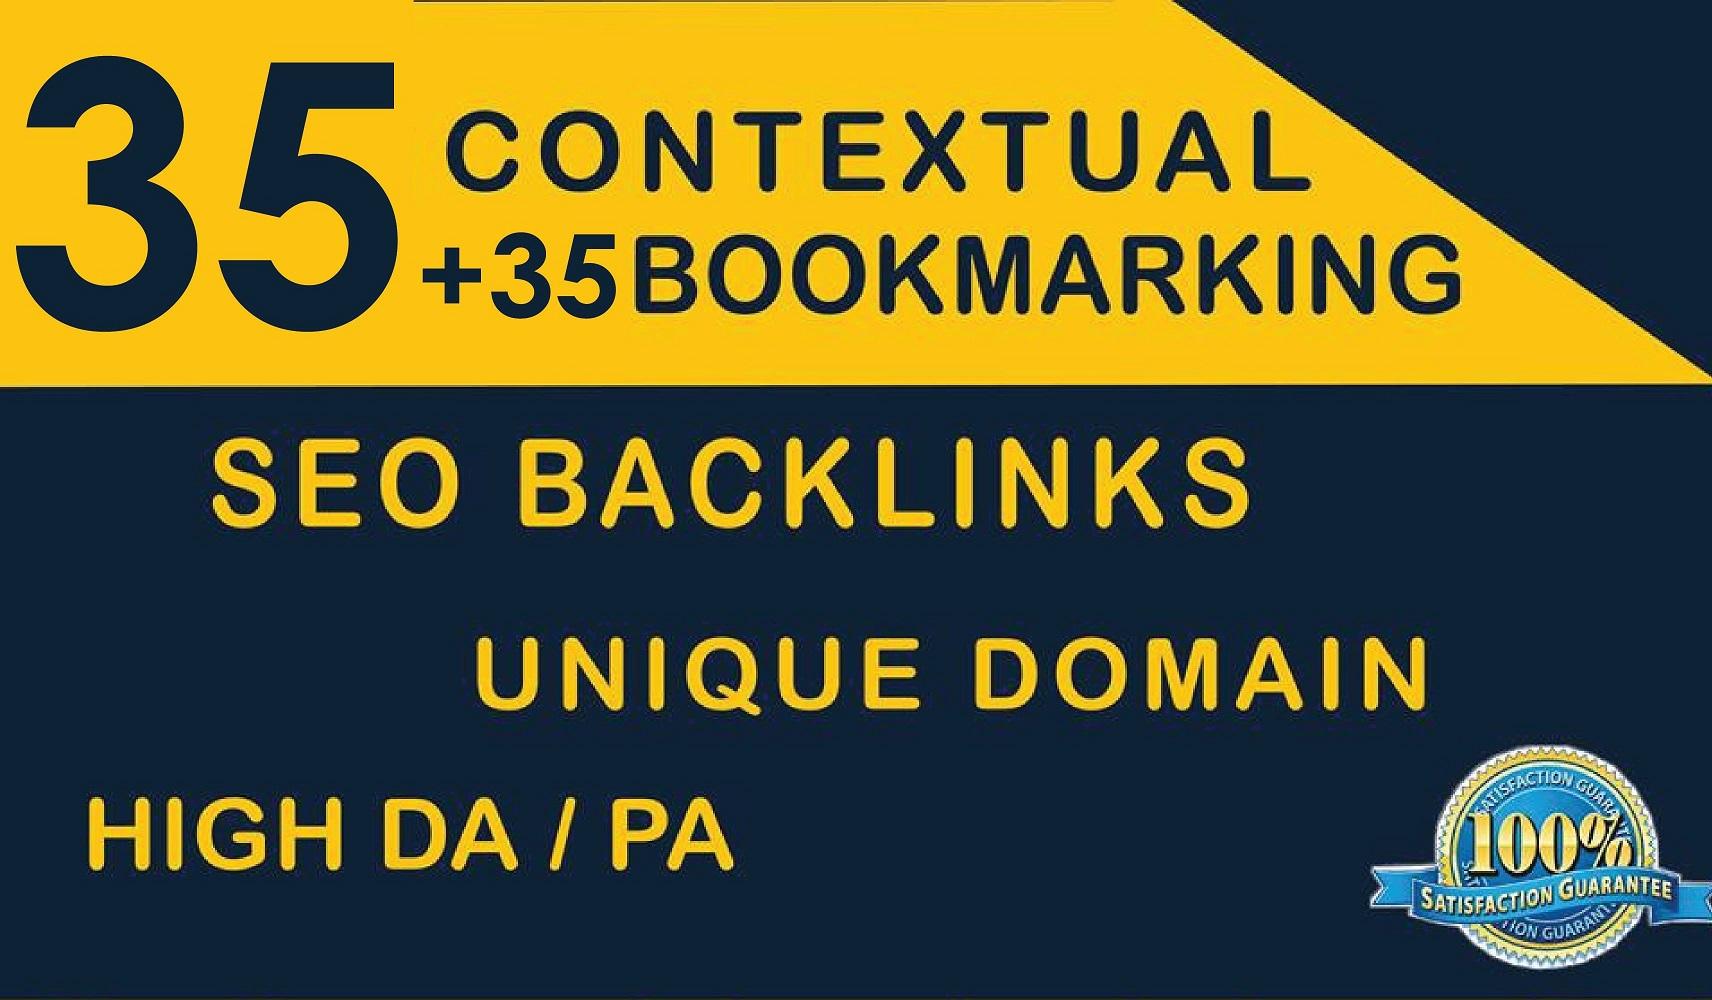 Build Seo Backlinks 35 Contextual + 35 SOCIAL Bookmaking Unique Domain High DA PA